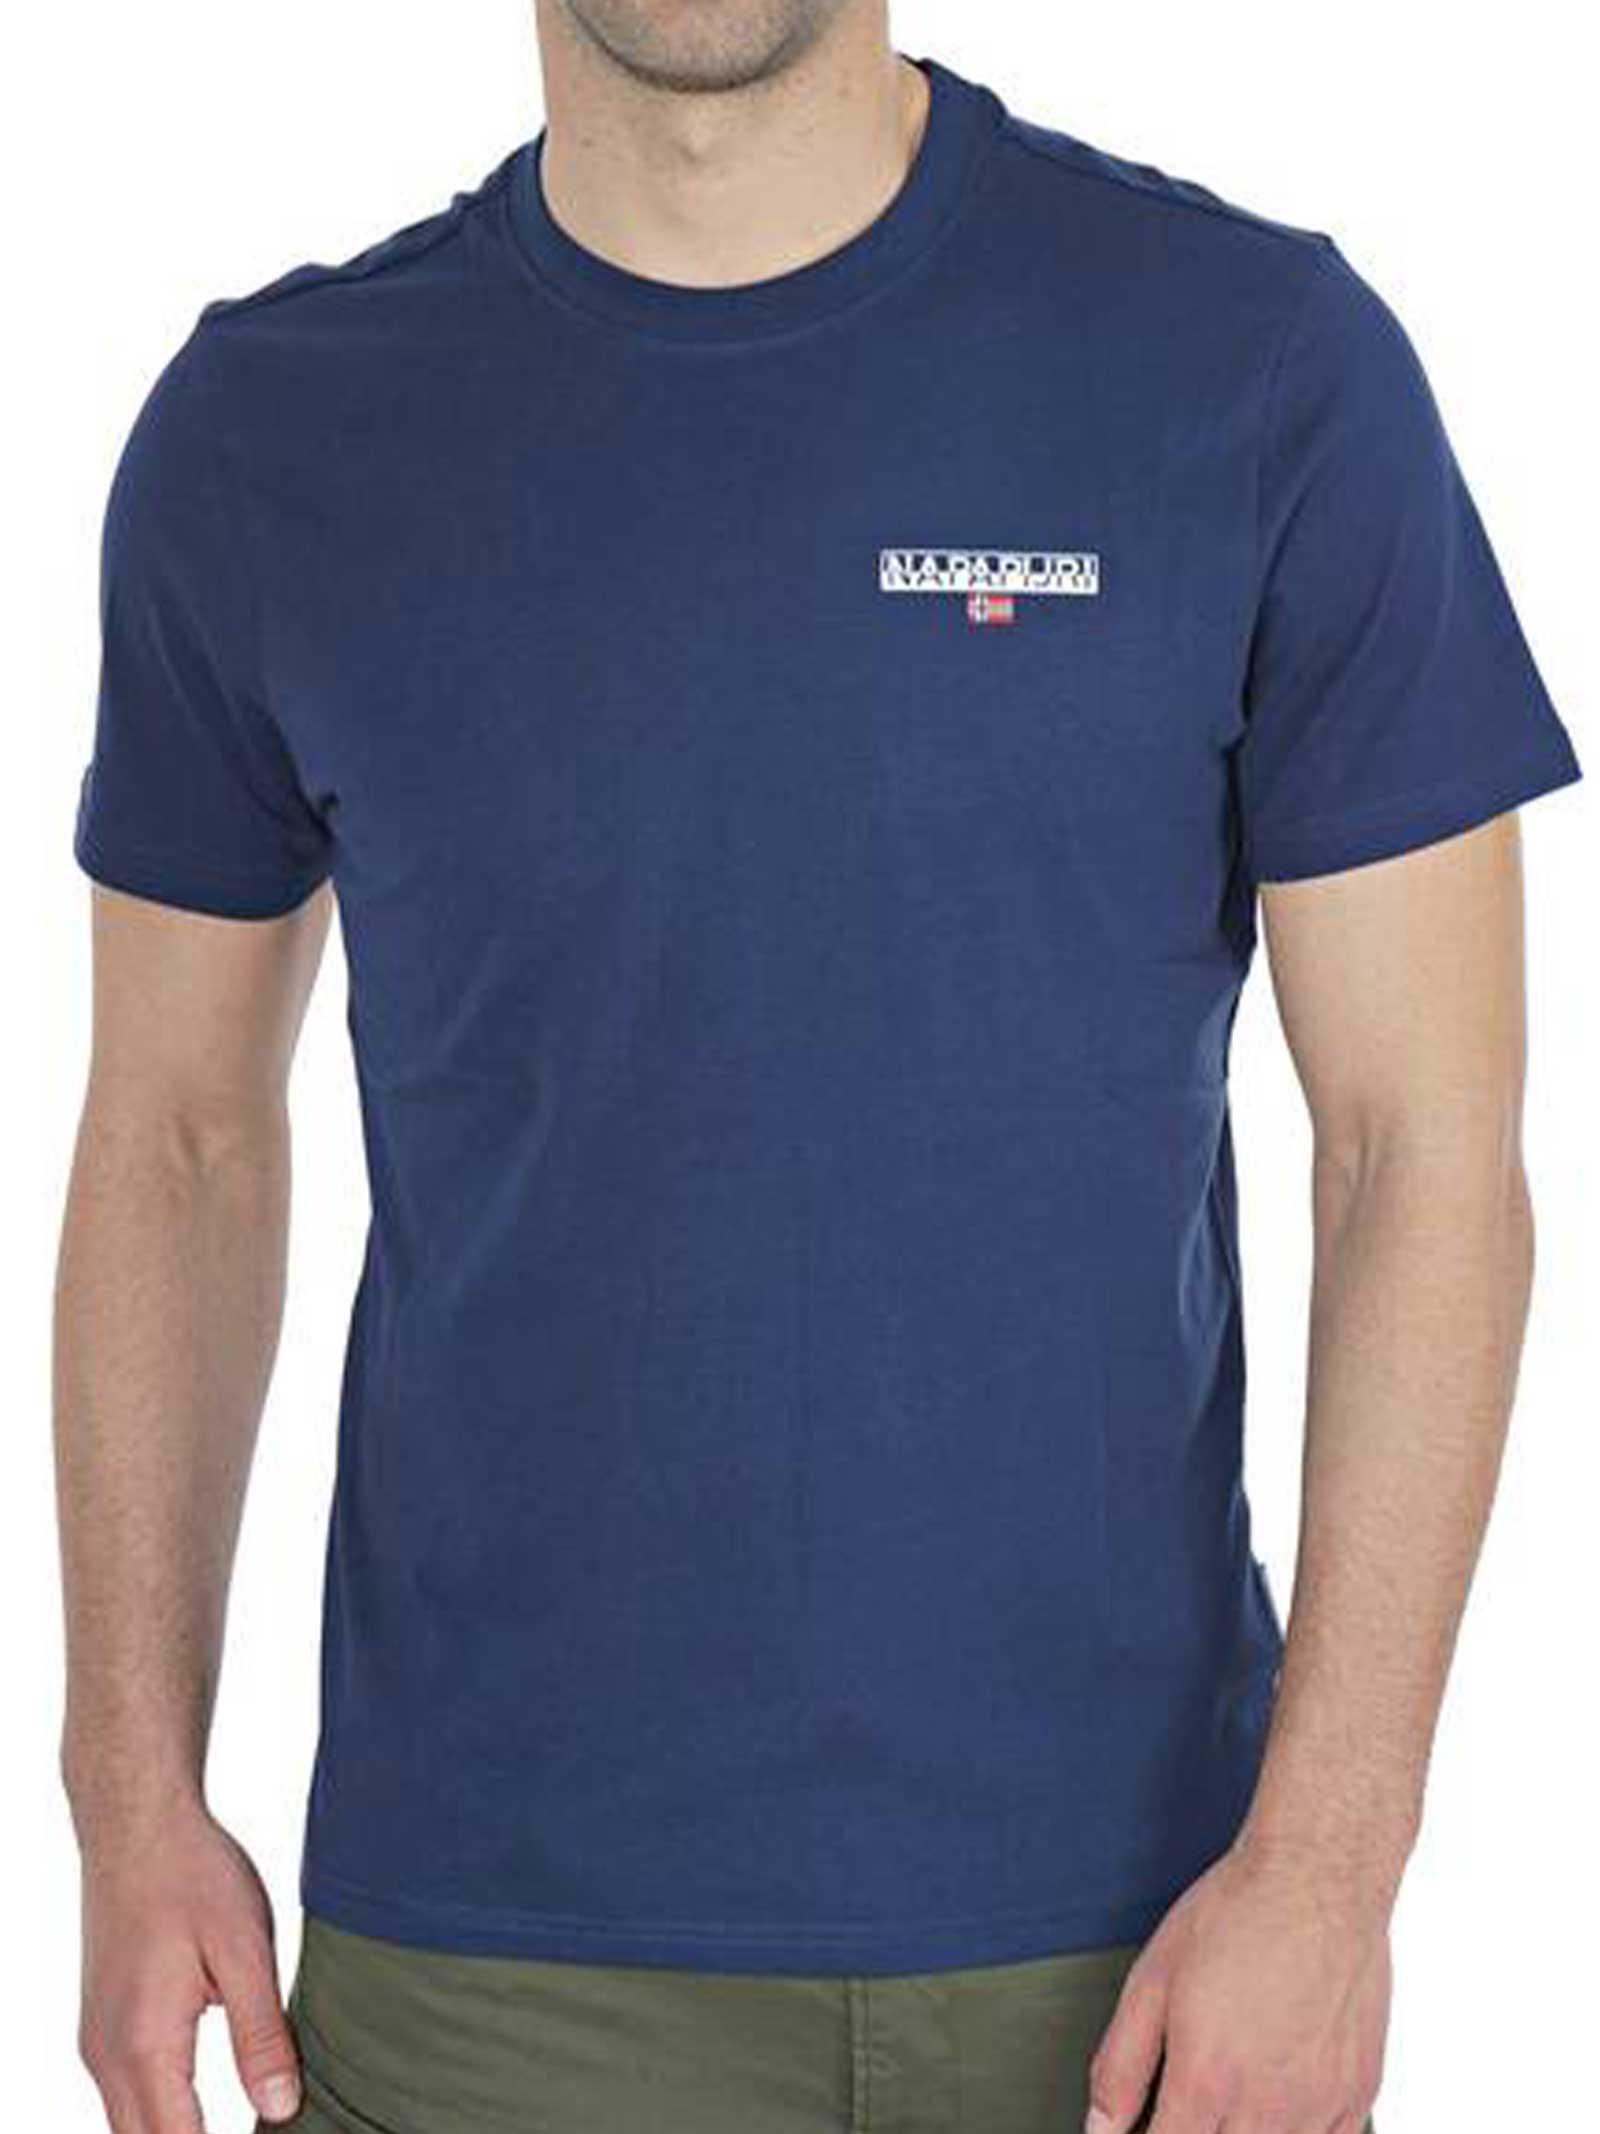 T-SHIRT UOMO NAPAPIJRI   T-shirt   NP0A4F6VBB6